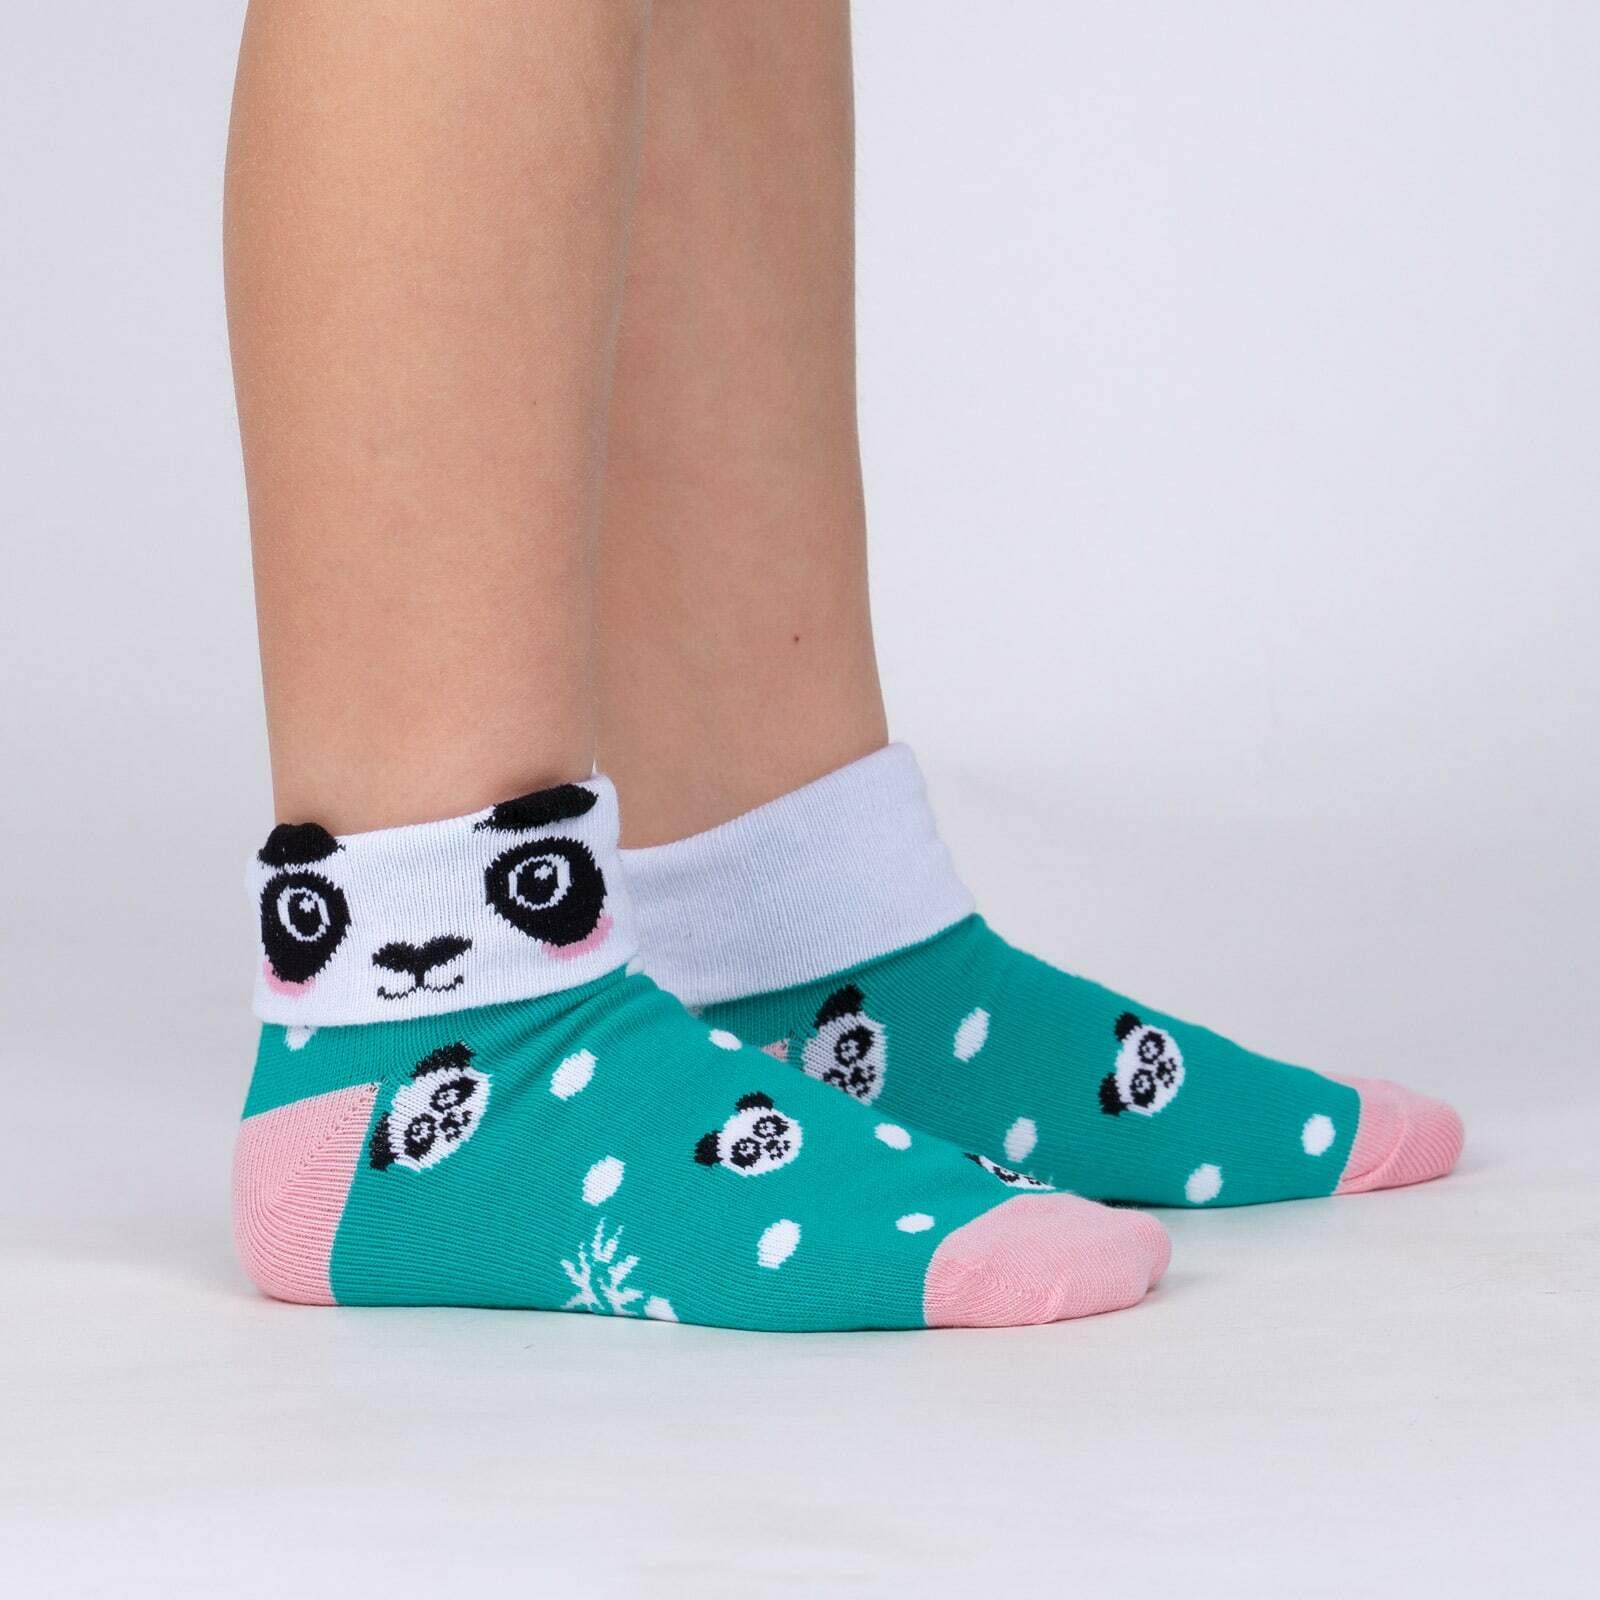 model side view of Panda Pair - Adorable Panda Bear Turn Cuff Socks - Youth